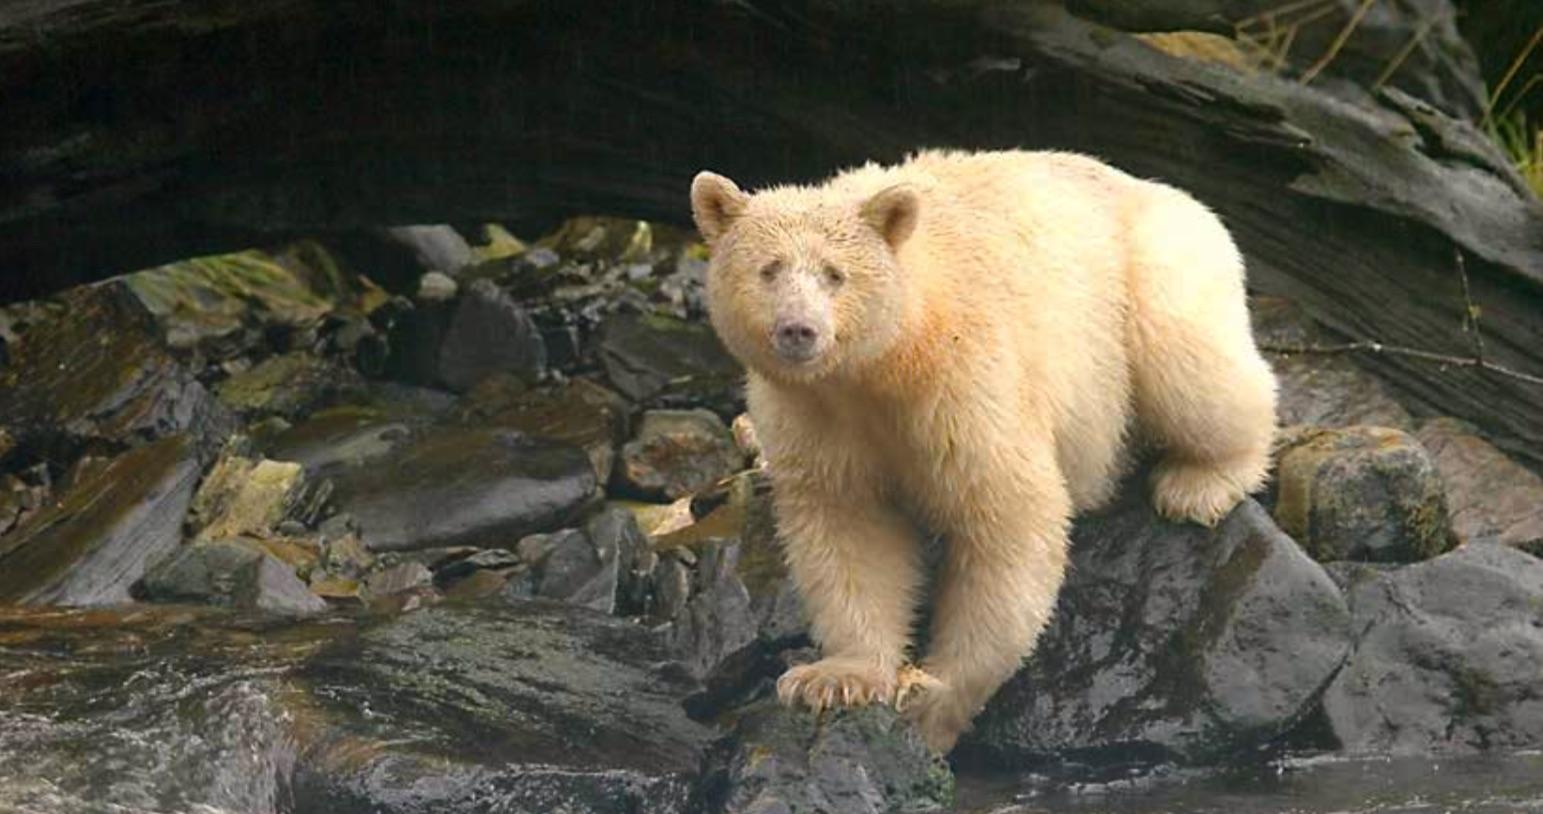 Polar Bear in Canada's Arctic region